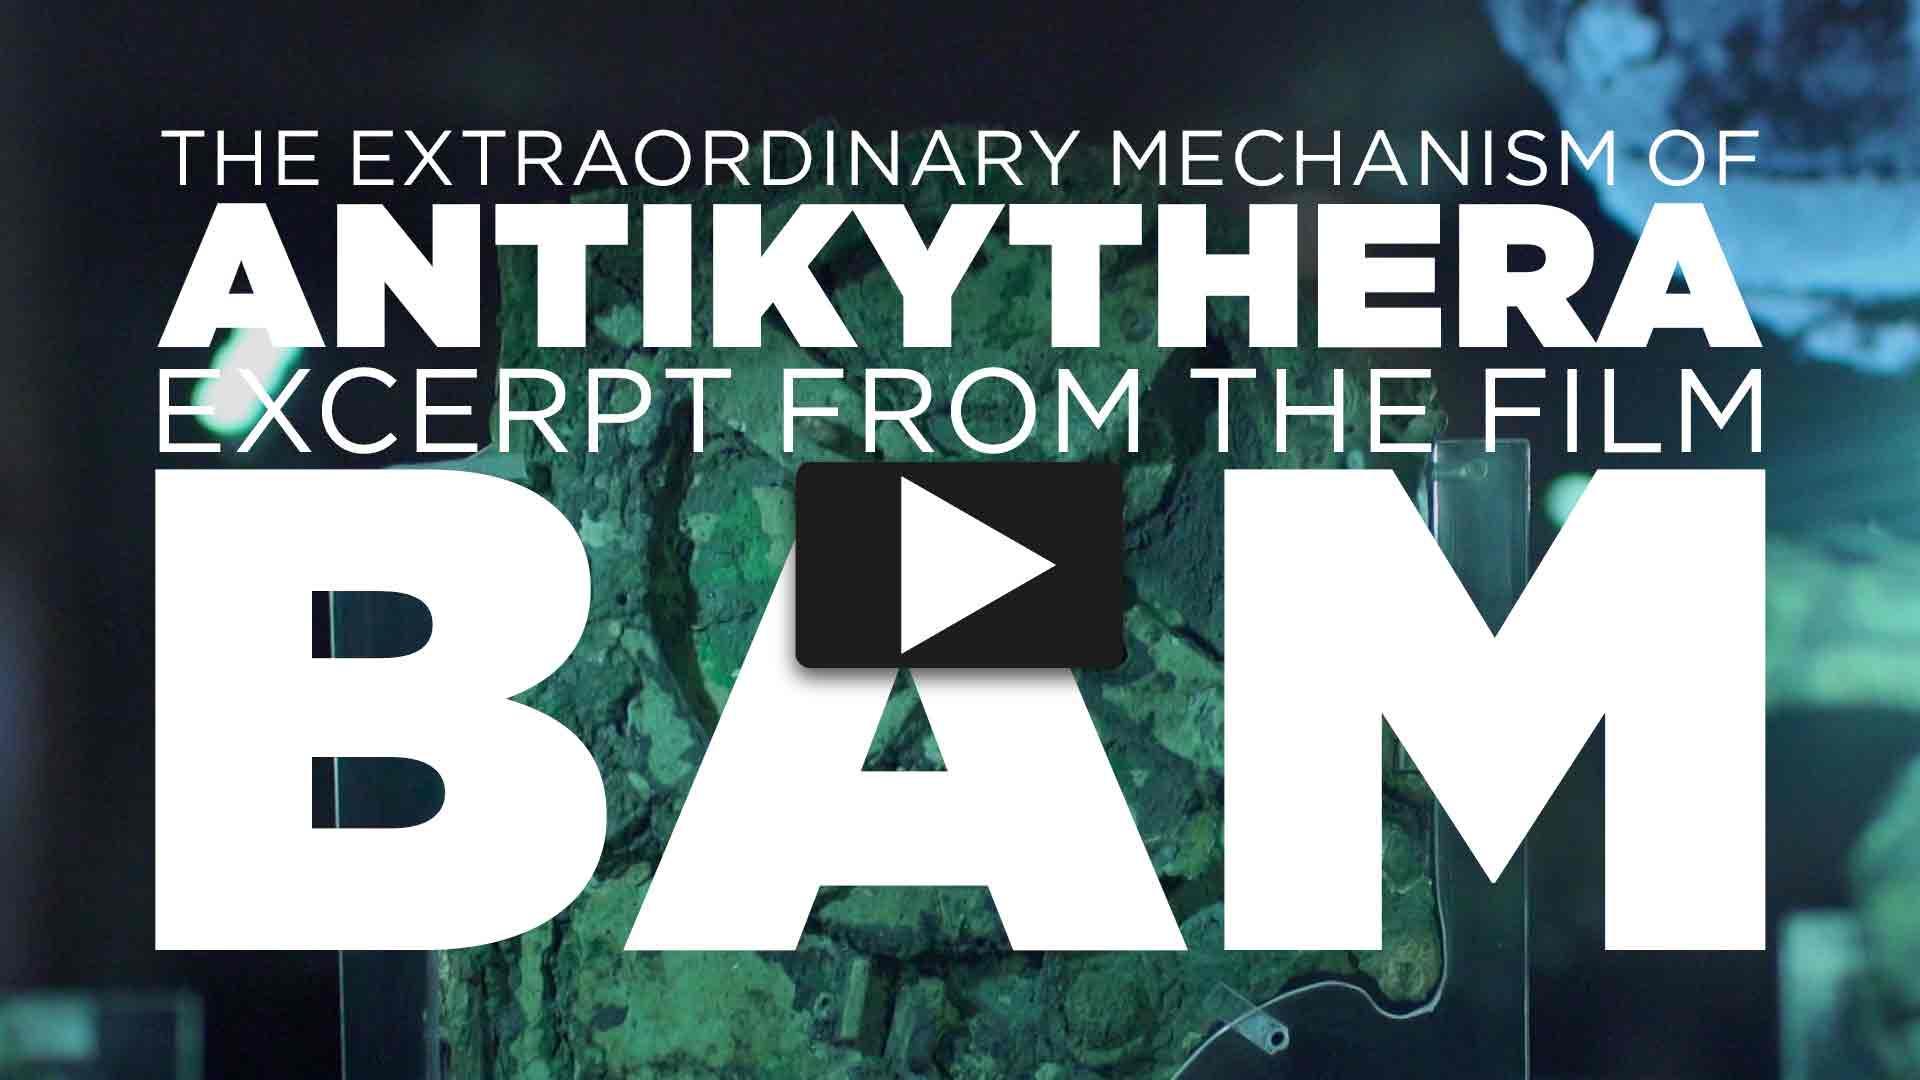 BAM-EXCERPT-ANTIKYTHERA-VIGNETTE